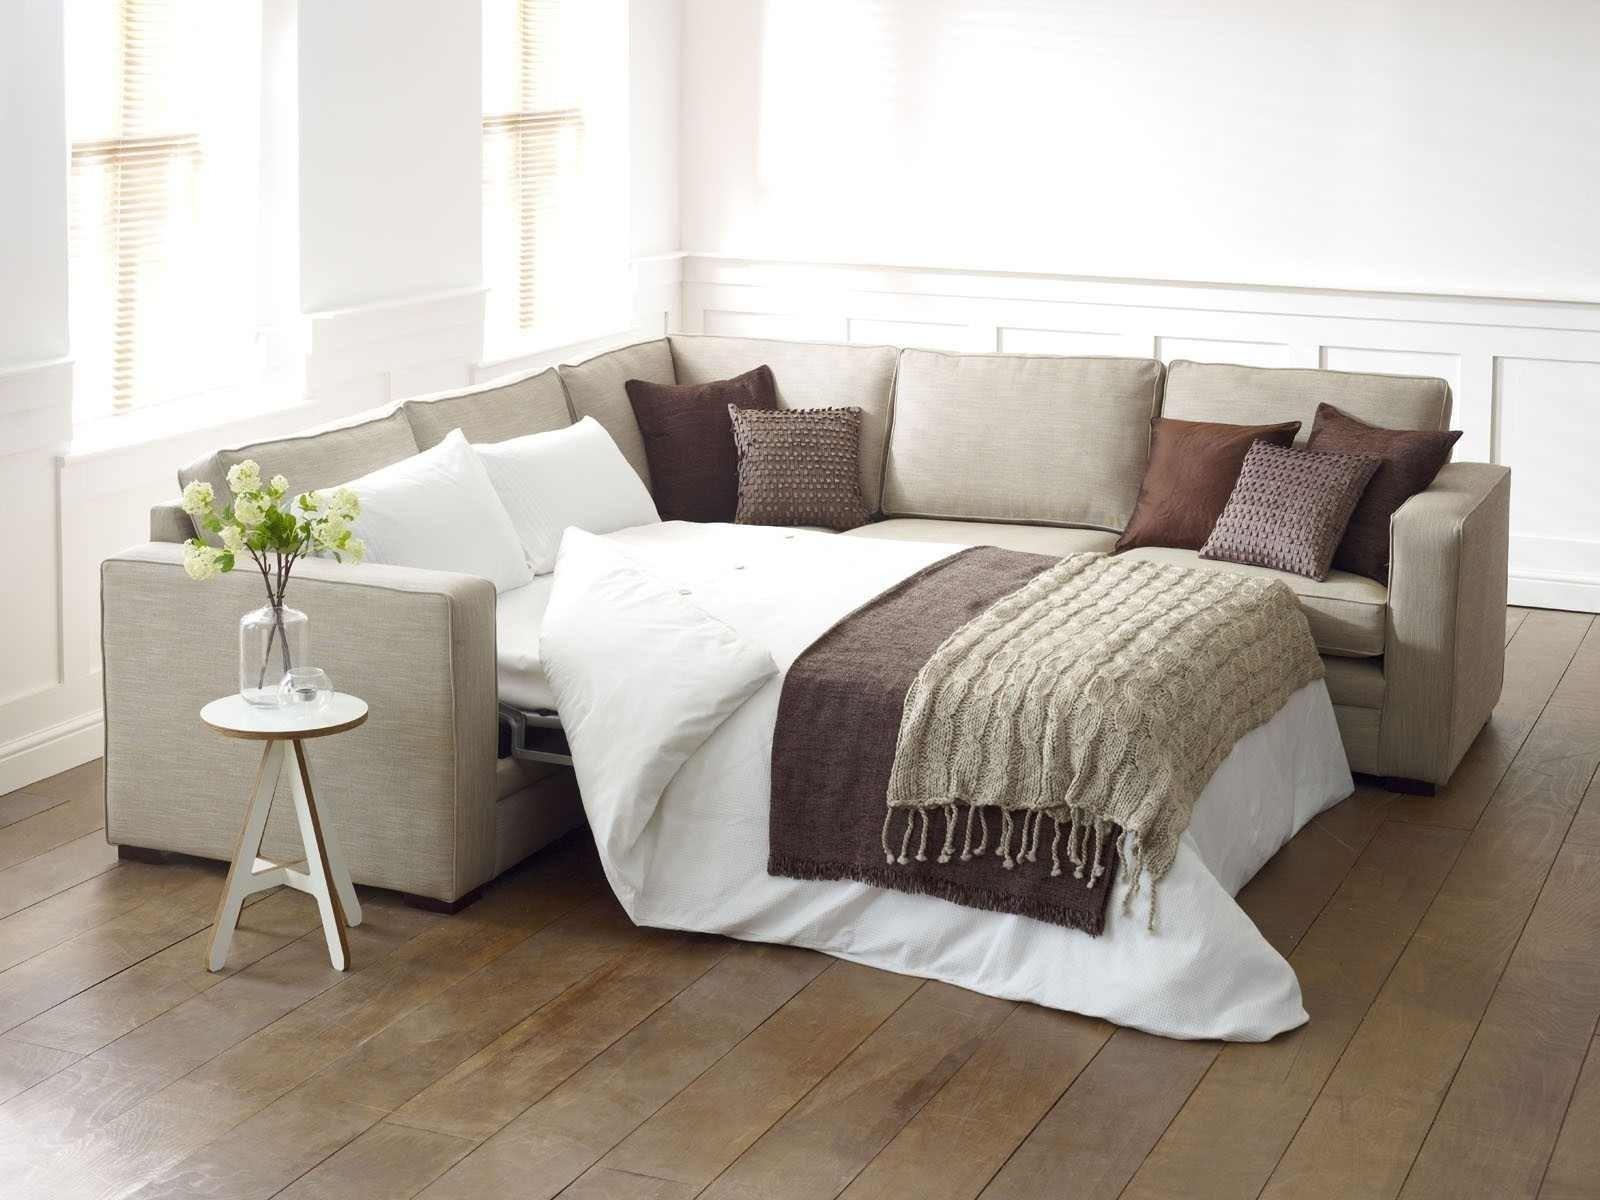 Corner Sleeper Sofa With Design Photo 8595 | Kengire Regarding Corner Sleeper Sofas (Image 6 of 20)